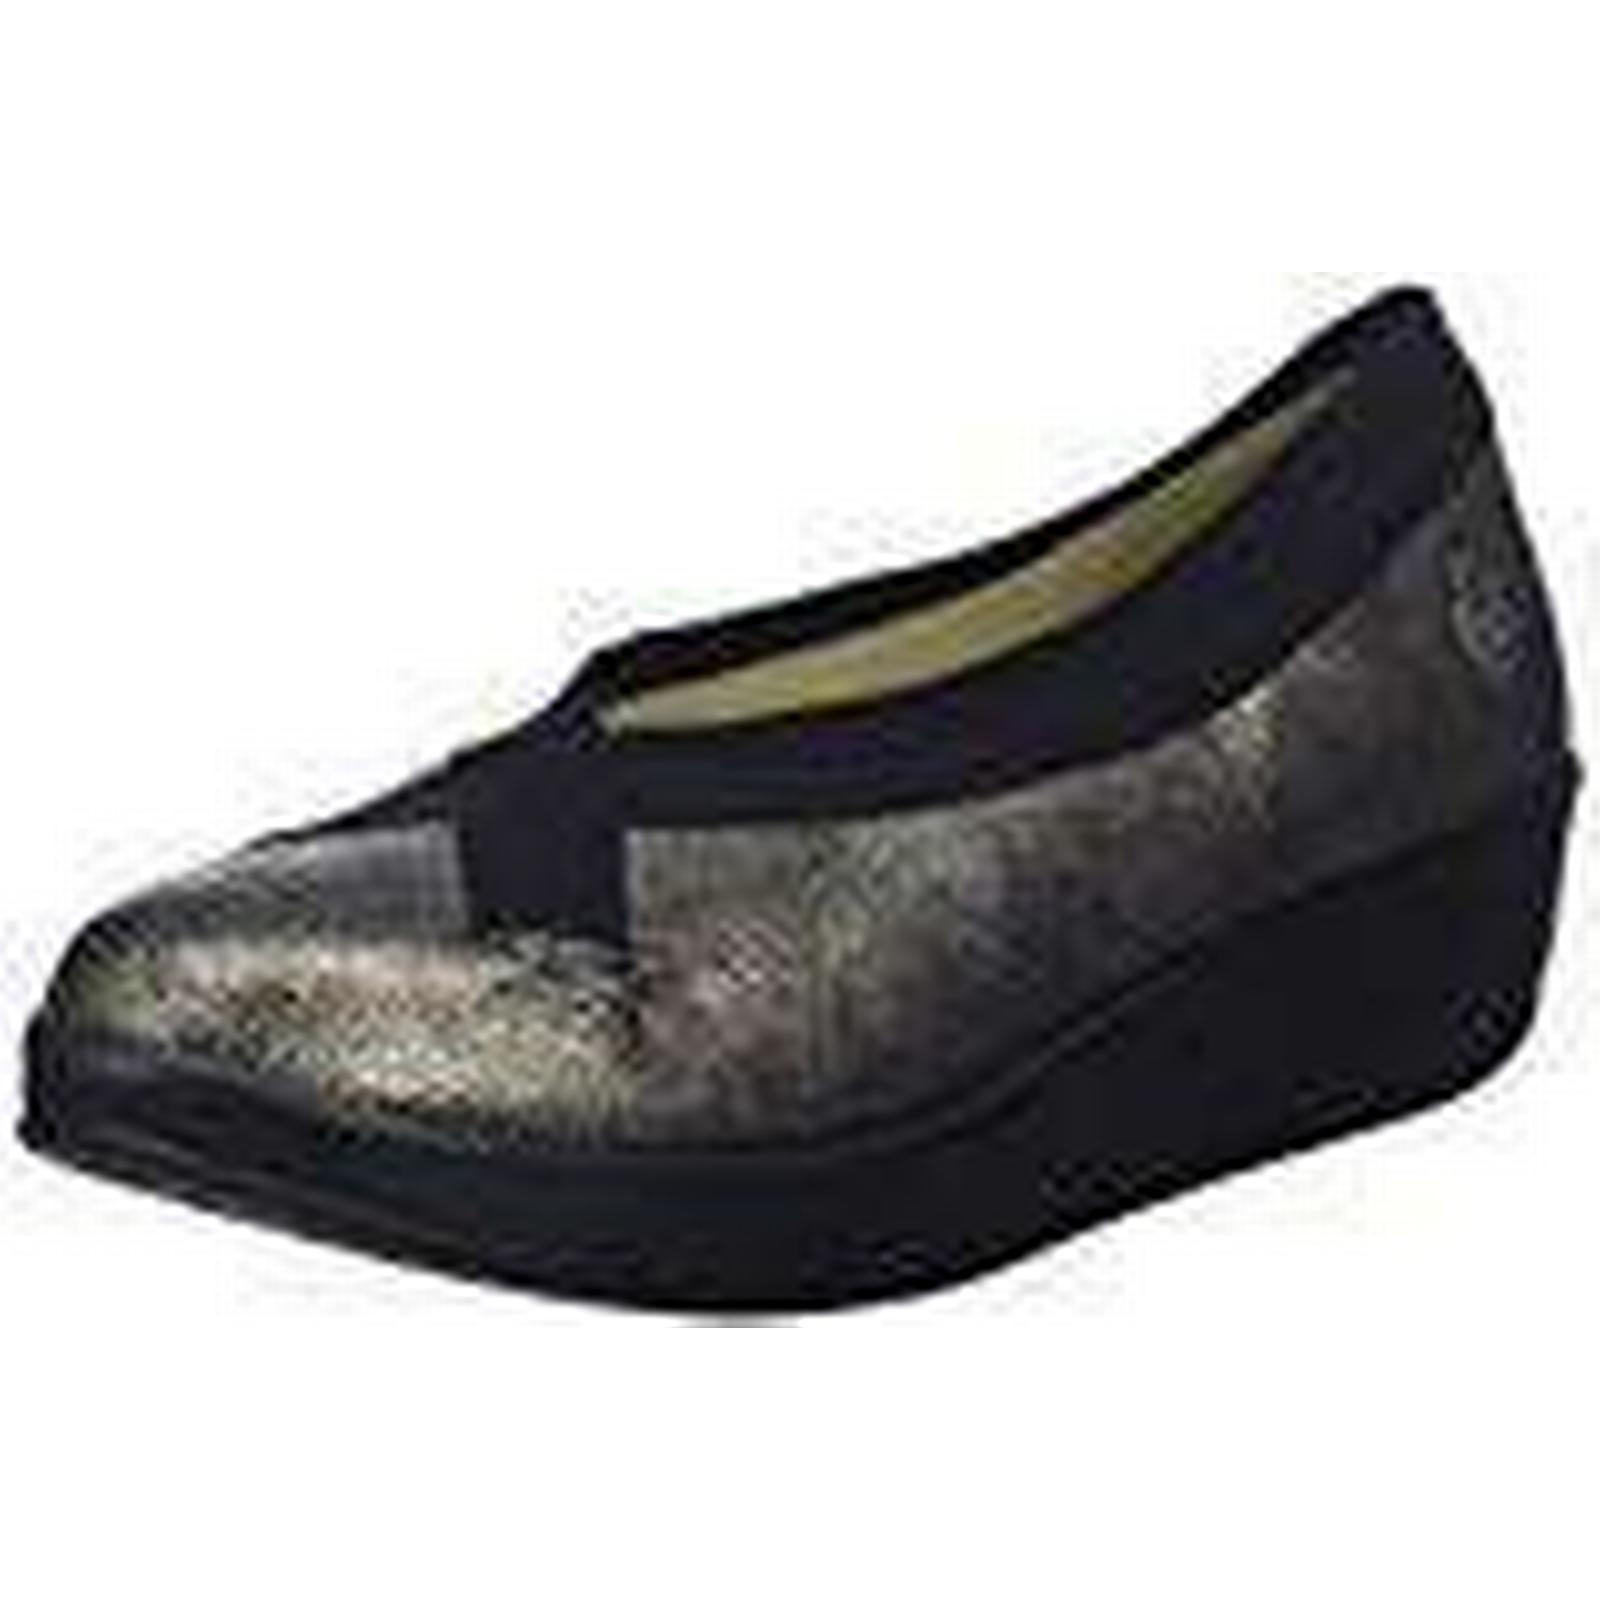 Fly London Women's Bobi (Graphite/Black), Closed Toe Ballet Flats, (Graphite/Black), Bobi 5 UK 38 EU e4bf87